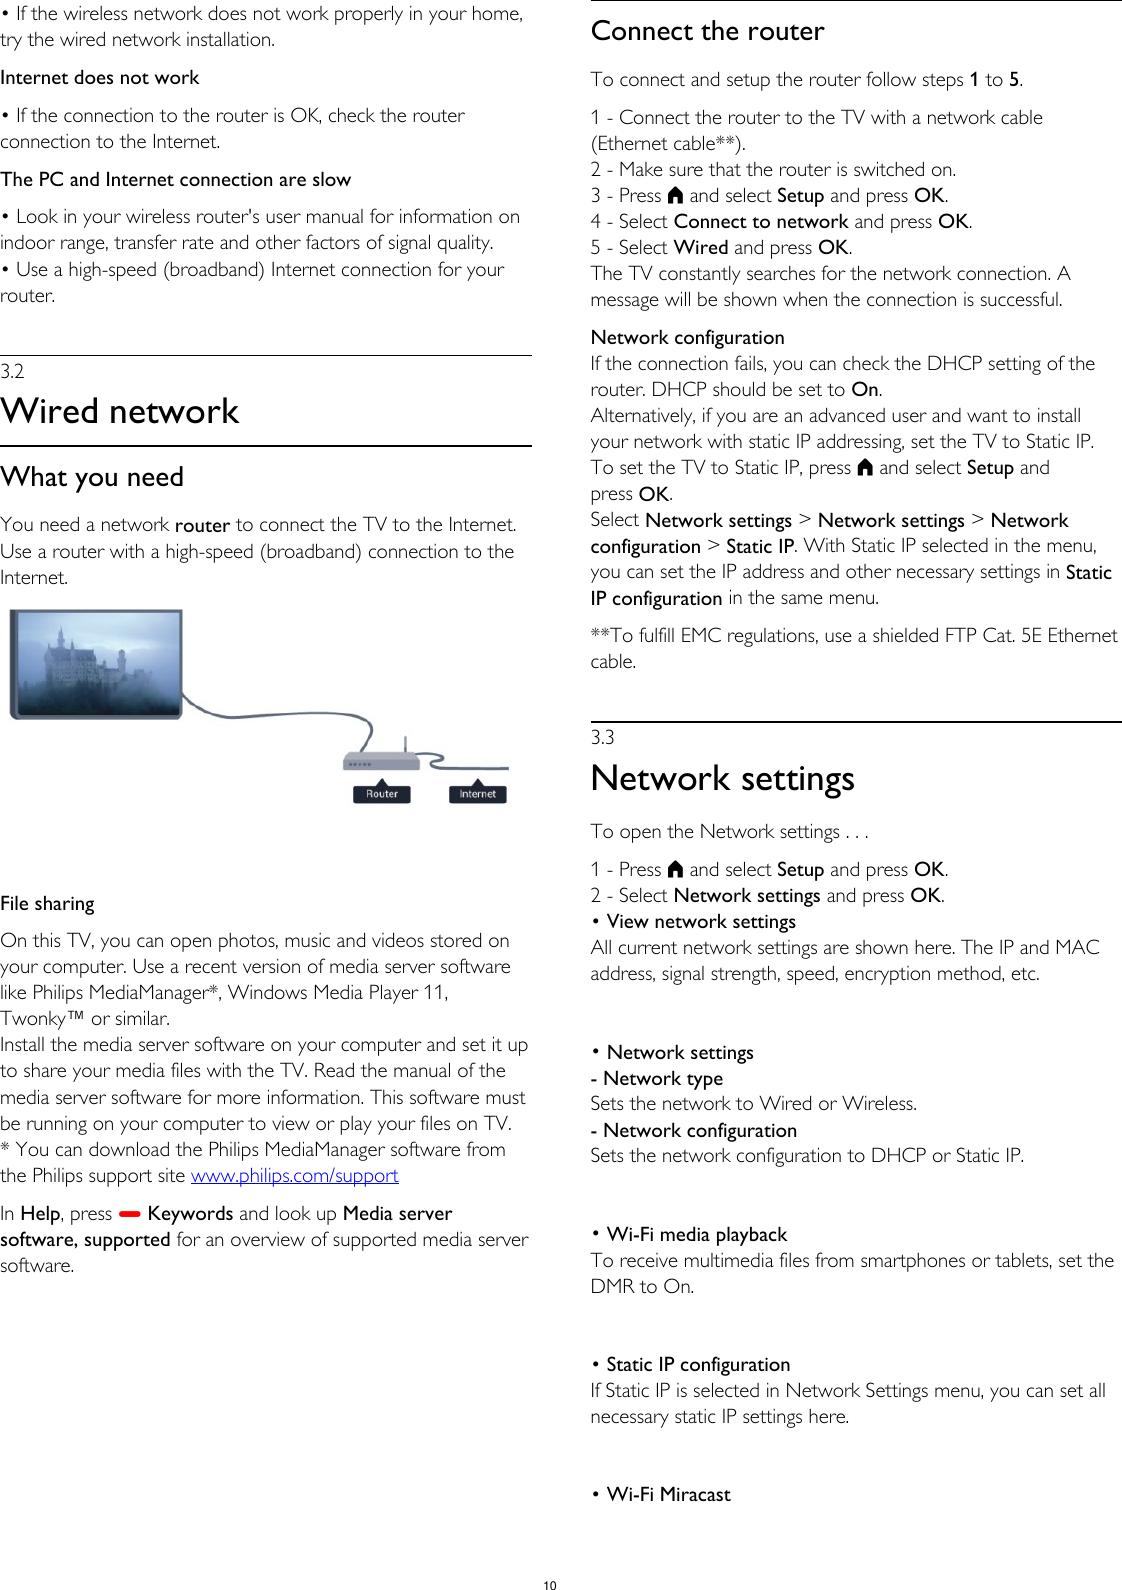 Philips 65PUT8609S/98 User Manual คู่มือผู้ใช้ 65put8609s 98